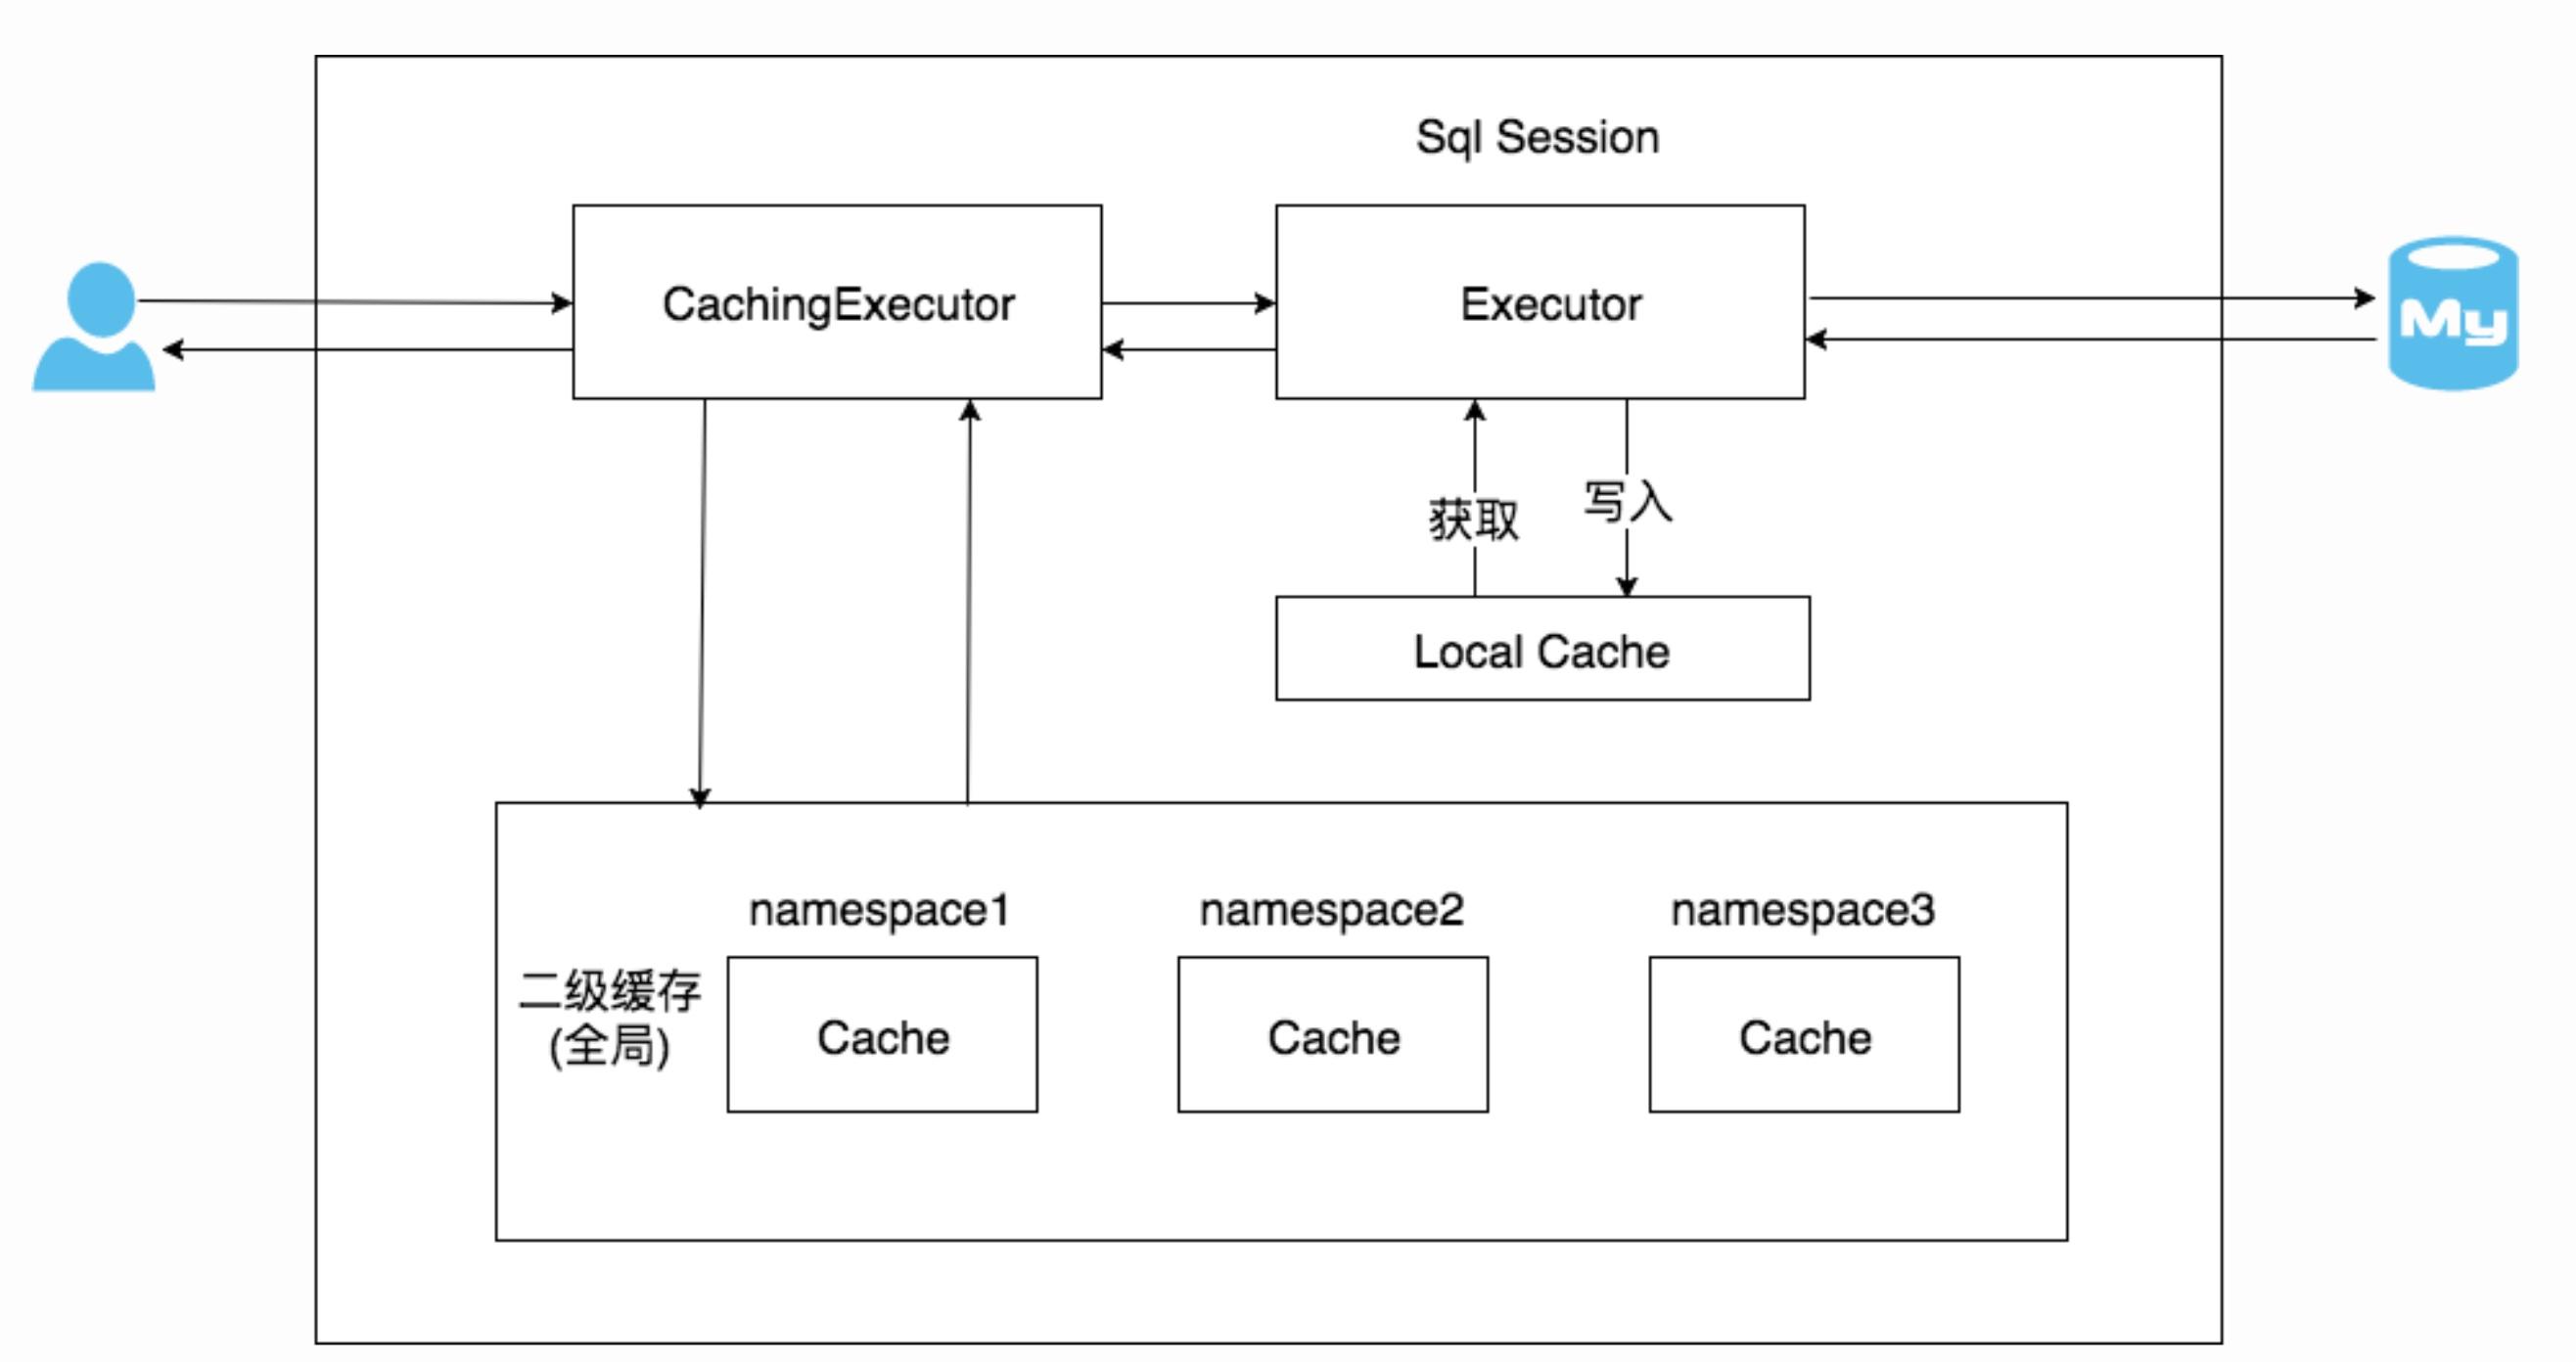 mybatis-cachingExecutor-workflow